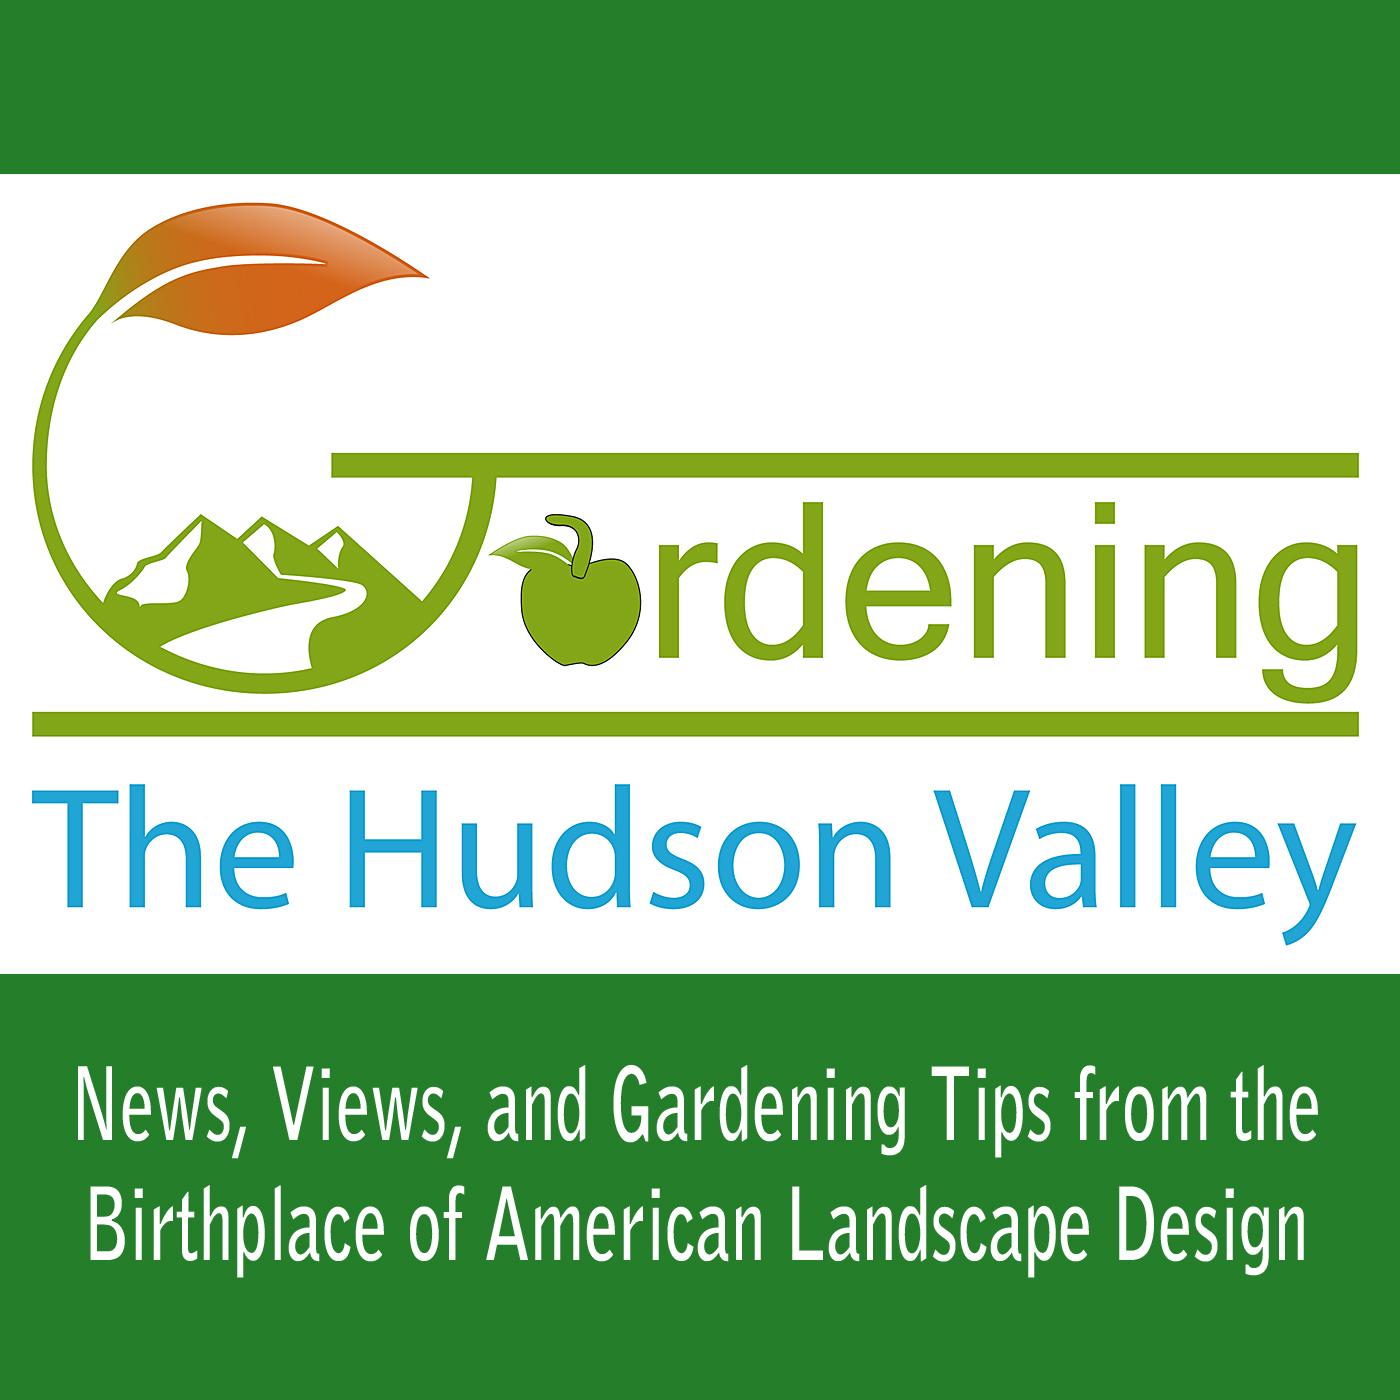 Gardening the Hudson Valley